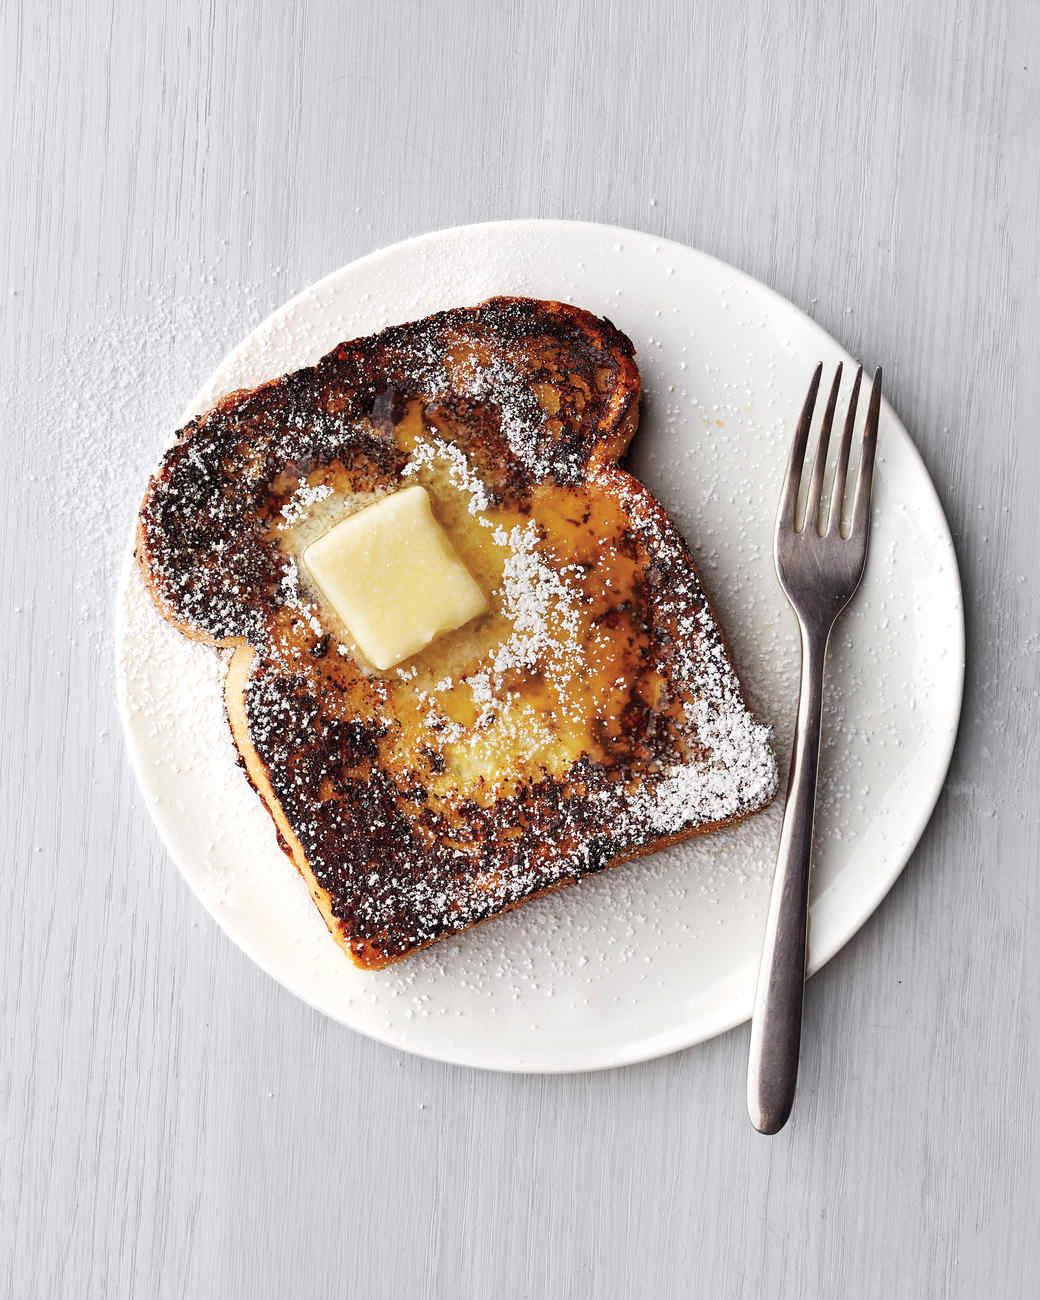 eggnog-french-toast-009-d111478.jpg